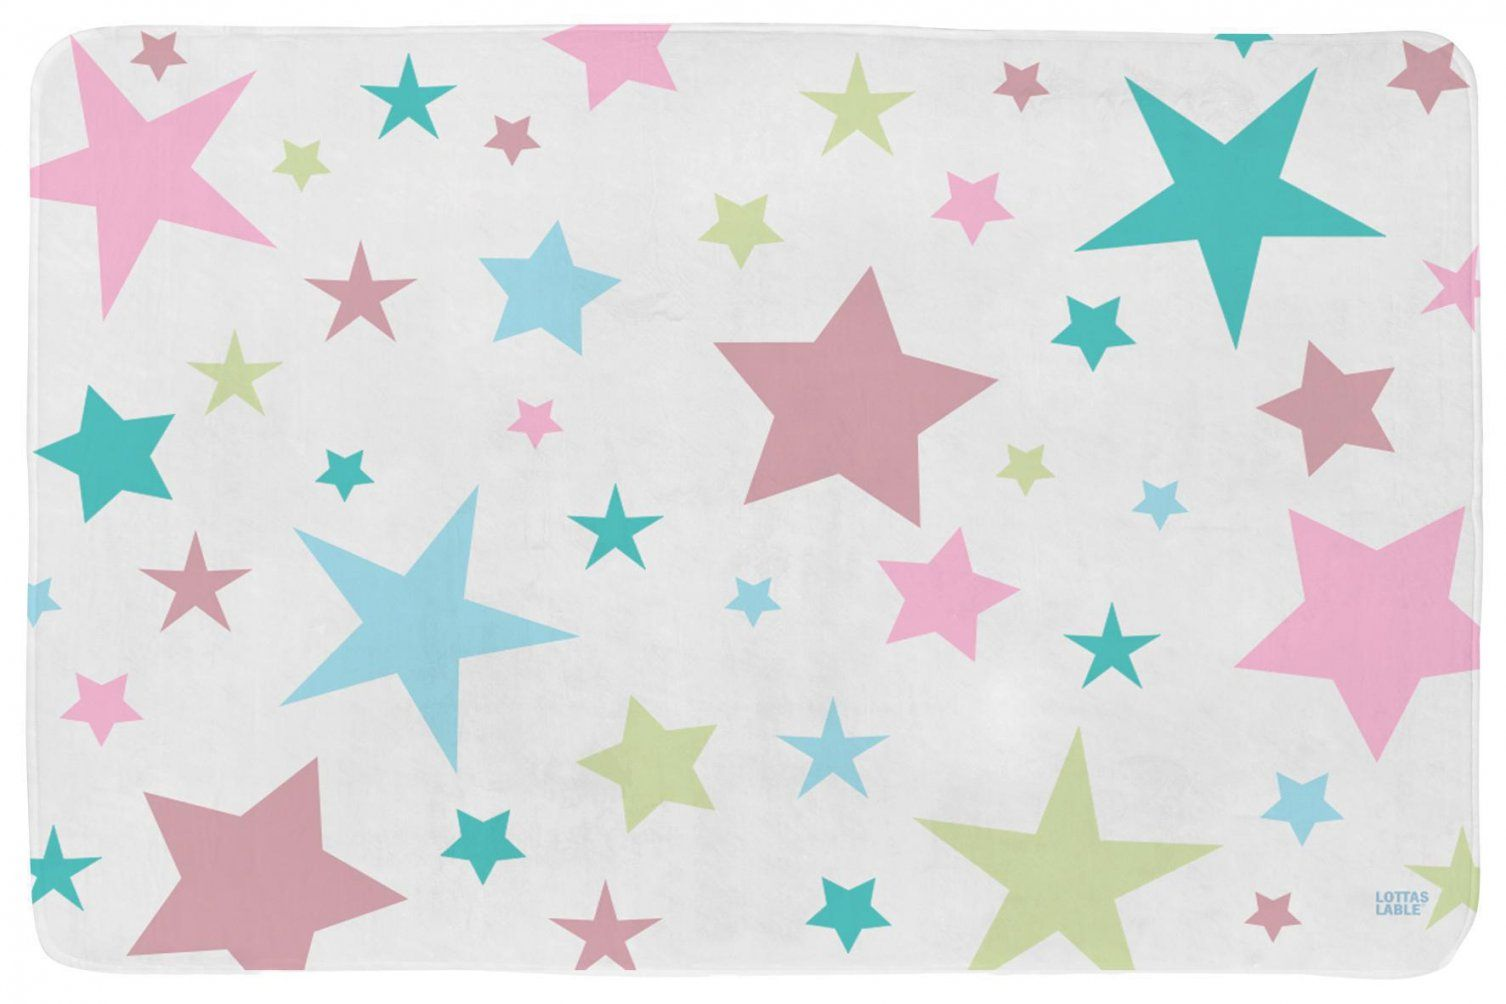 Lottas Lable Kinderteppich Partysterne Mädchen  Waschbare von Lottas Lable Teppich Sterne Photo